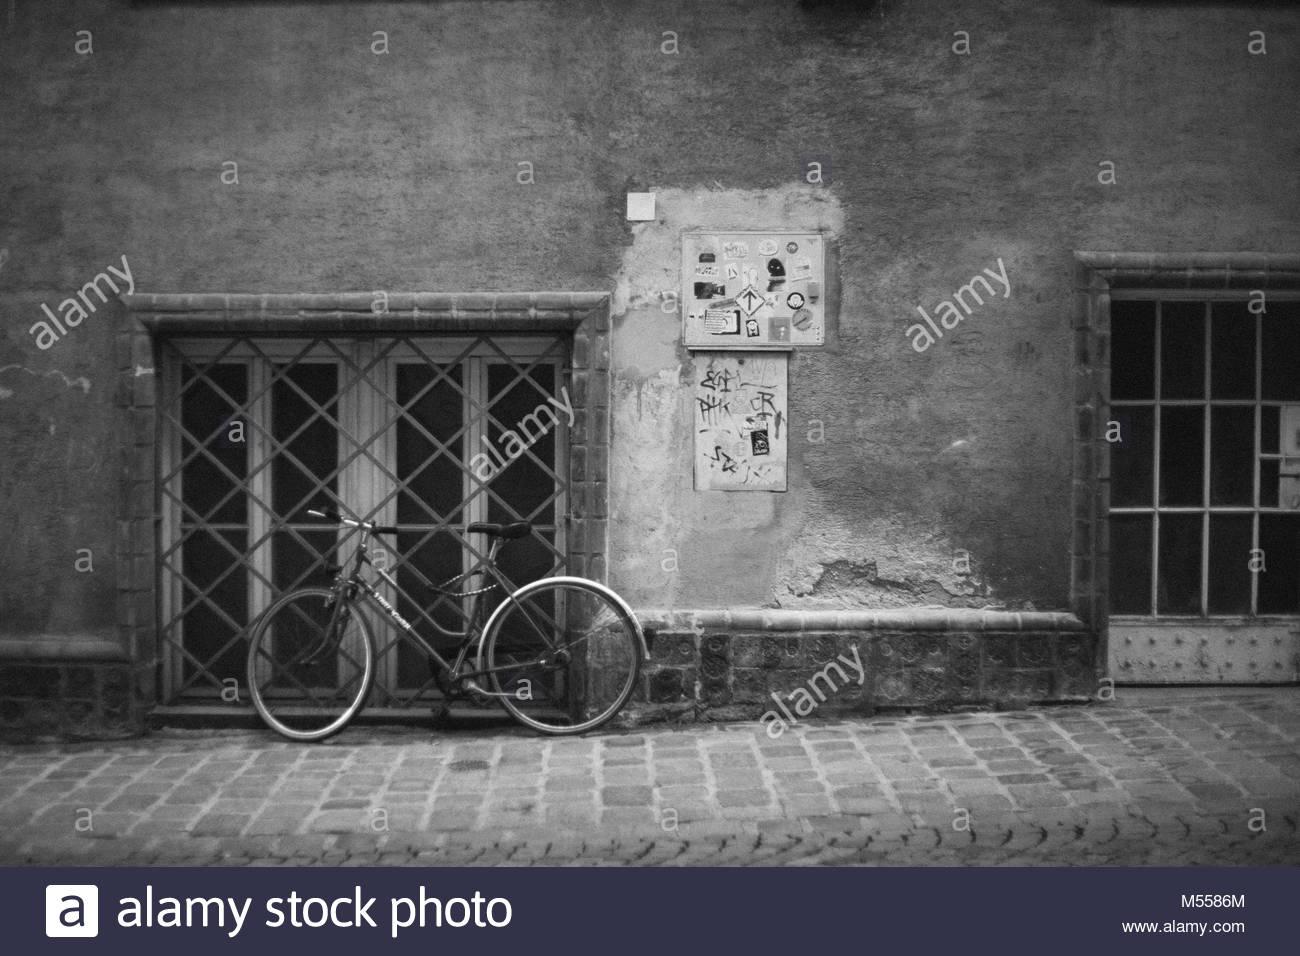 Fahrrad an einer Wand Stockbild